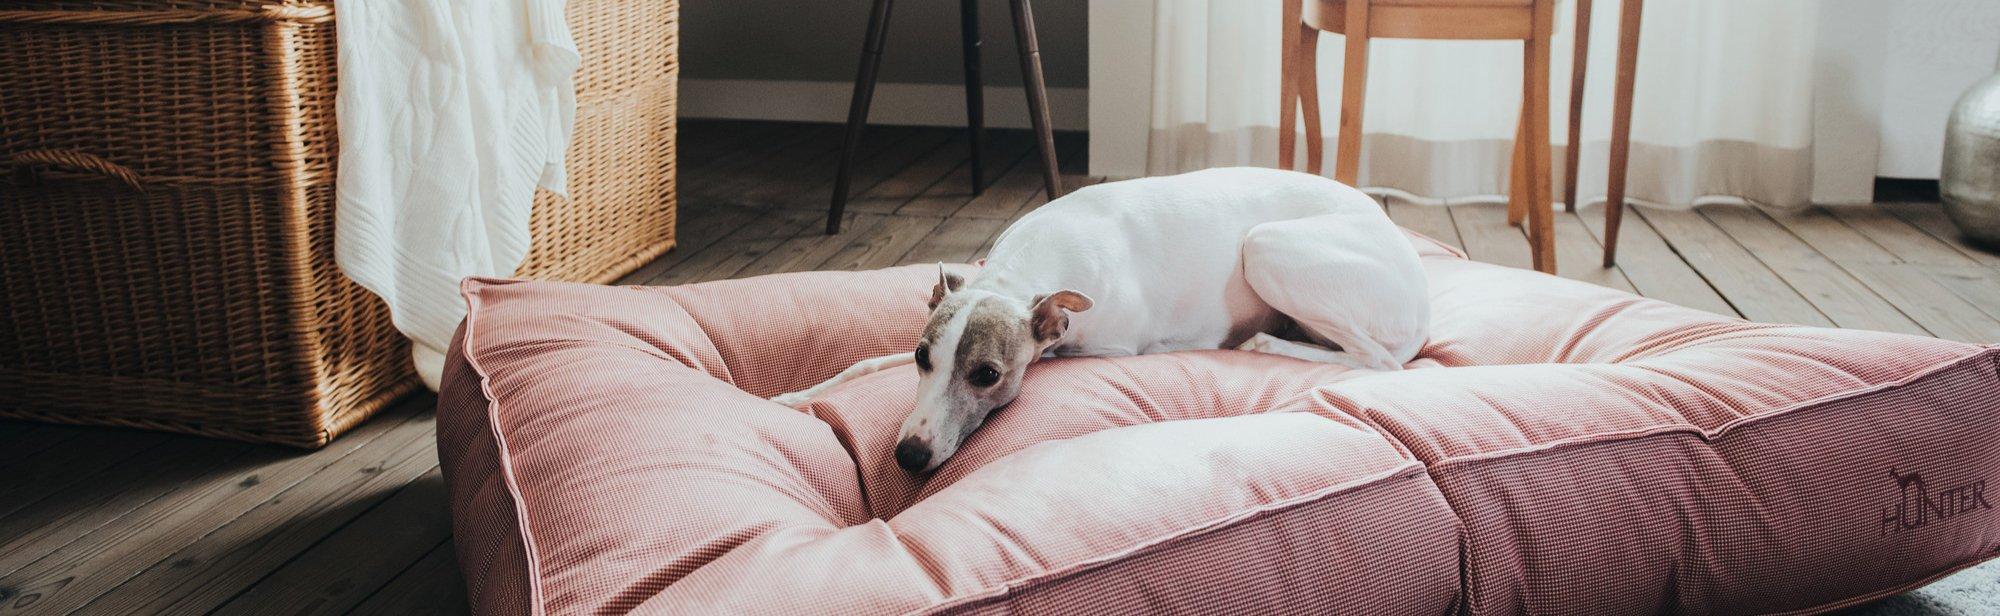 Hundeschlafplätze günstig kaufen